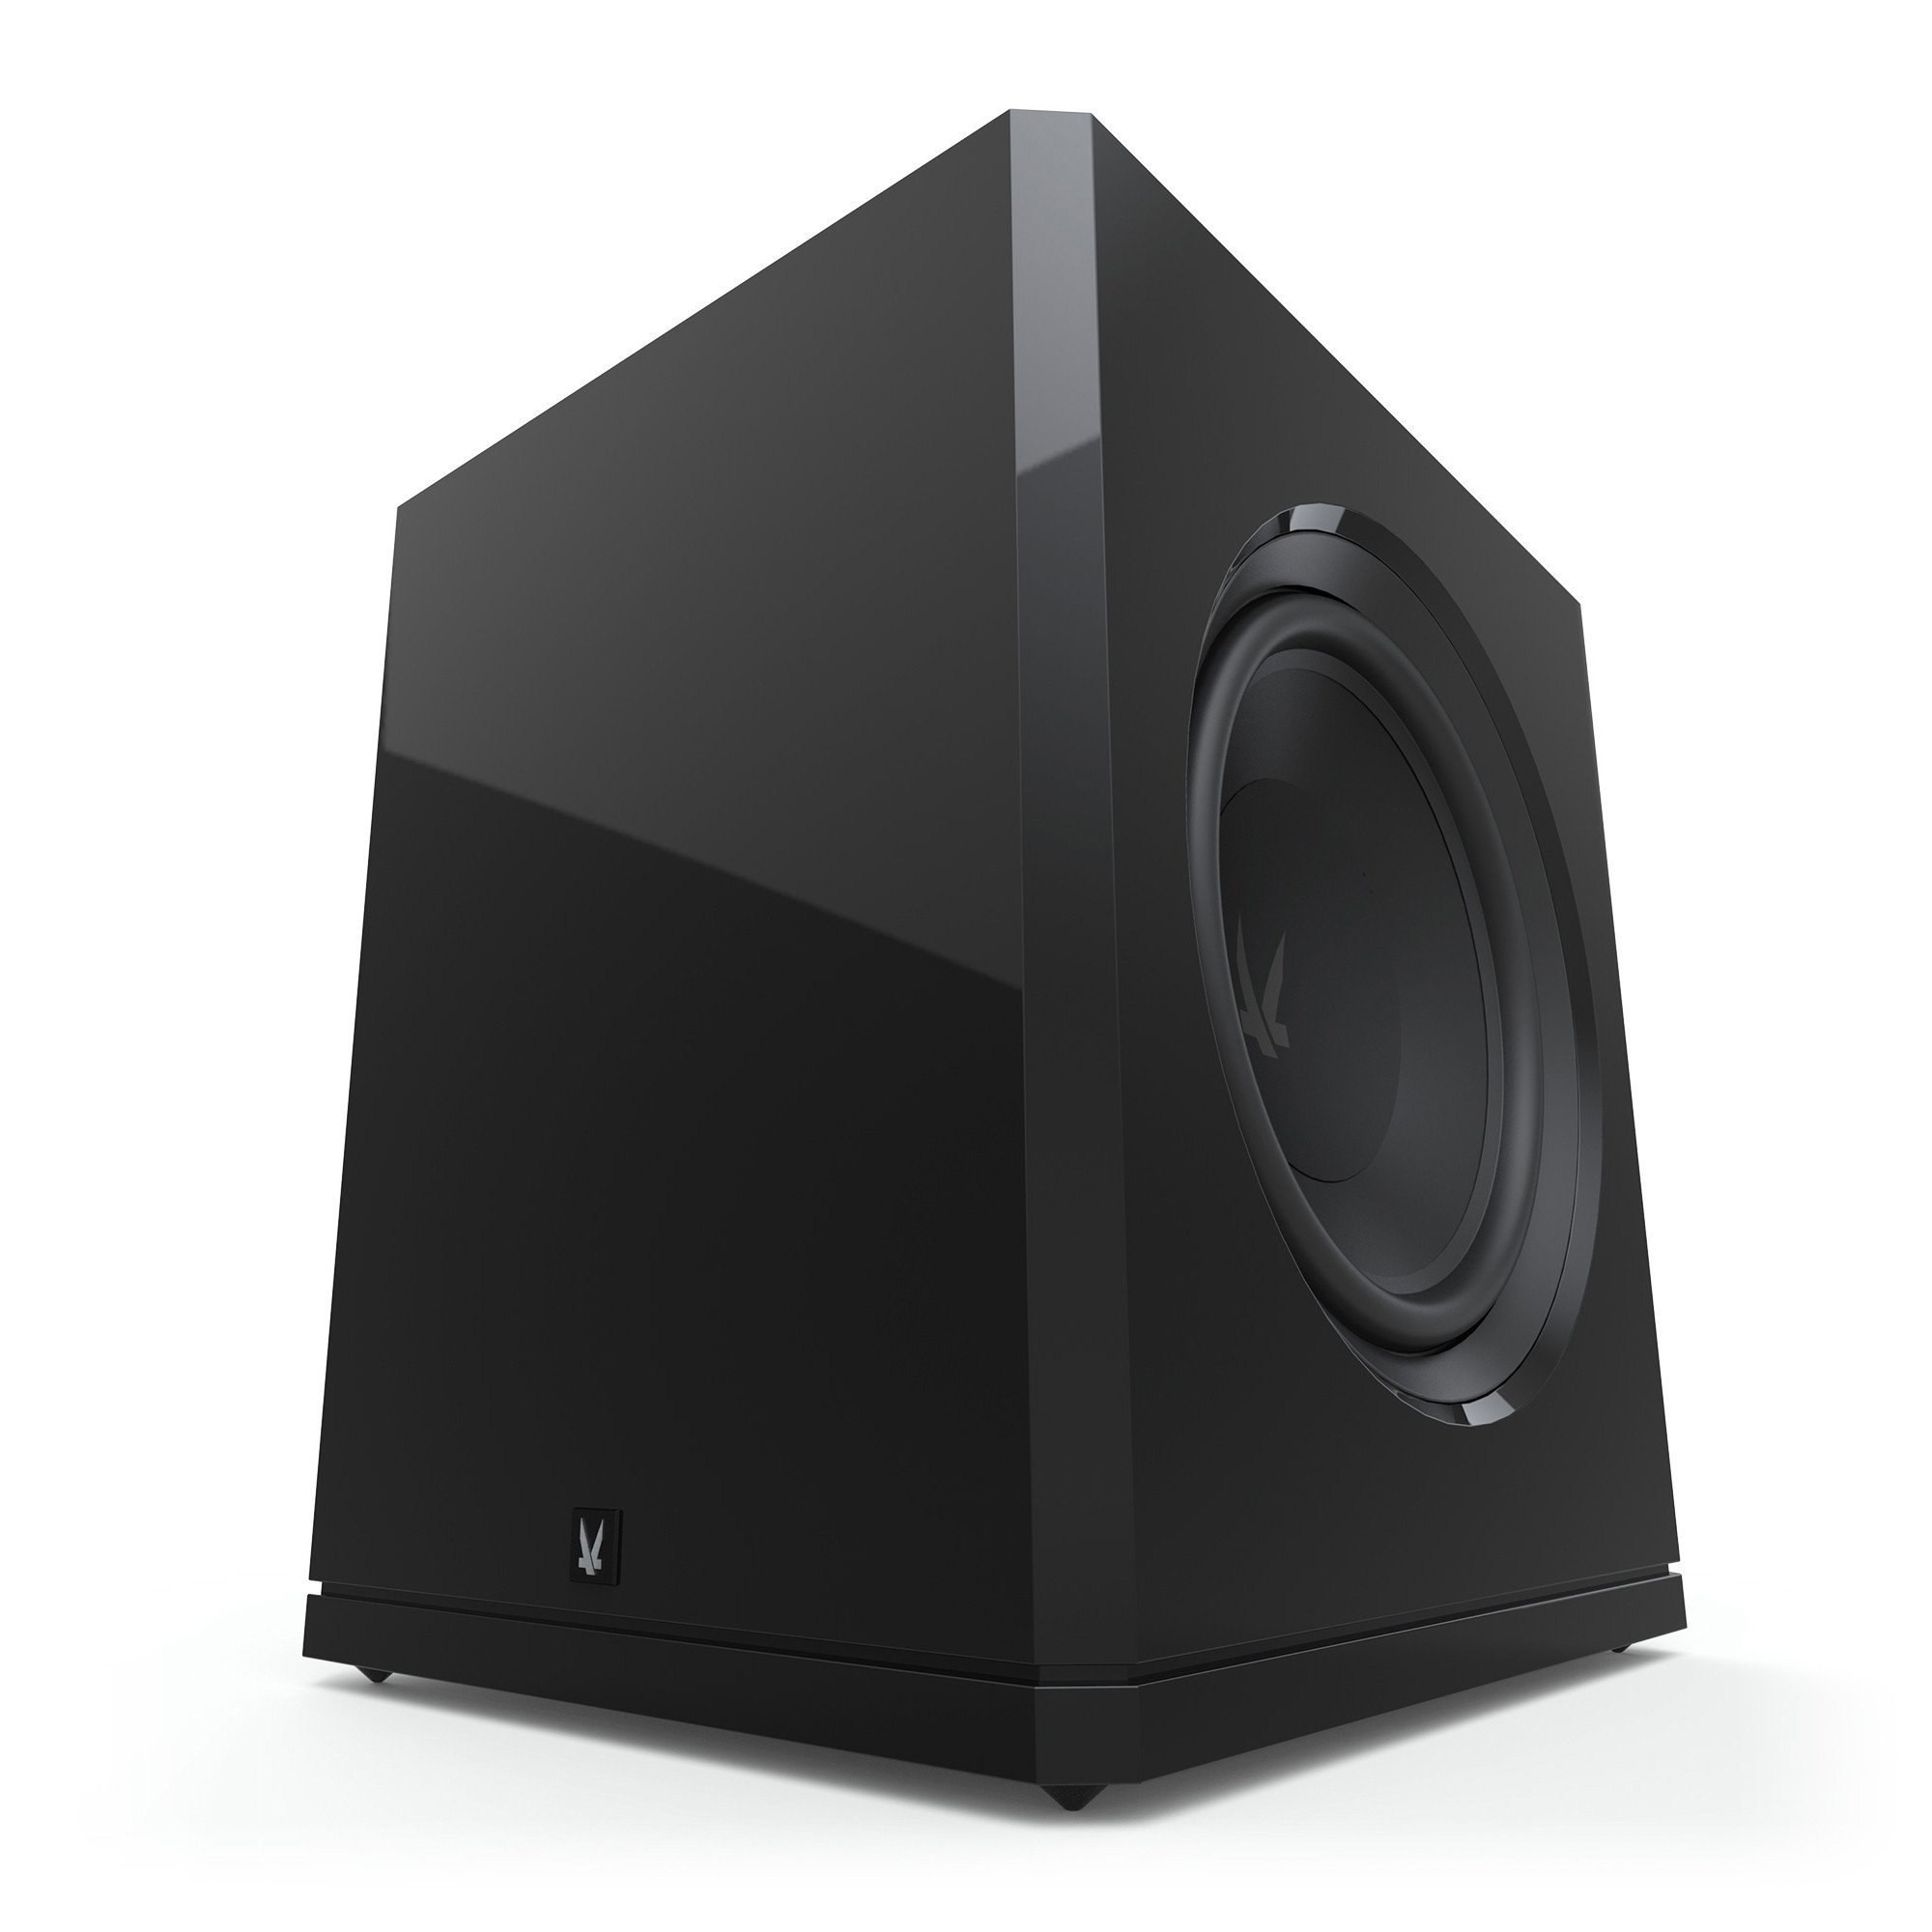 dfx audio enhancer free download cnet